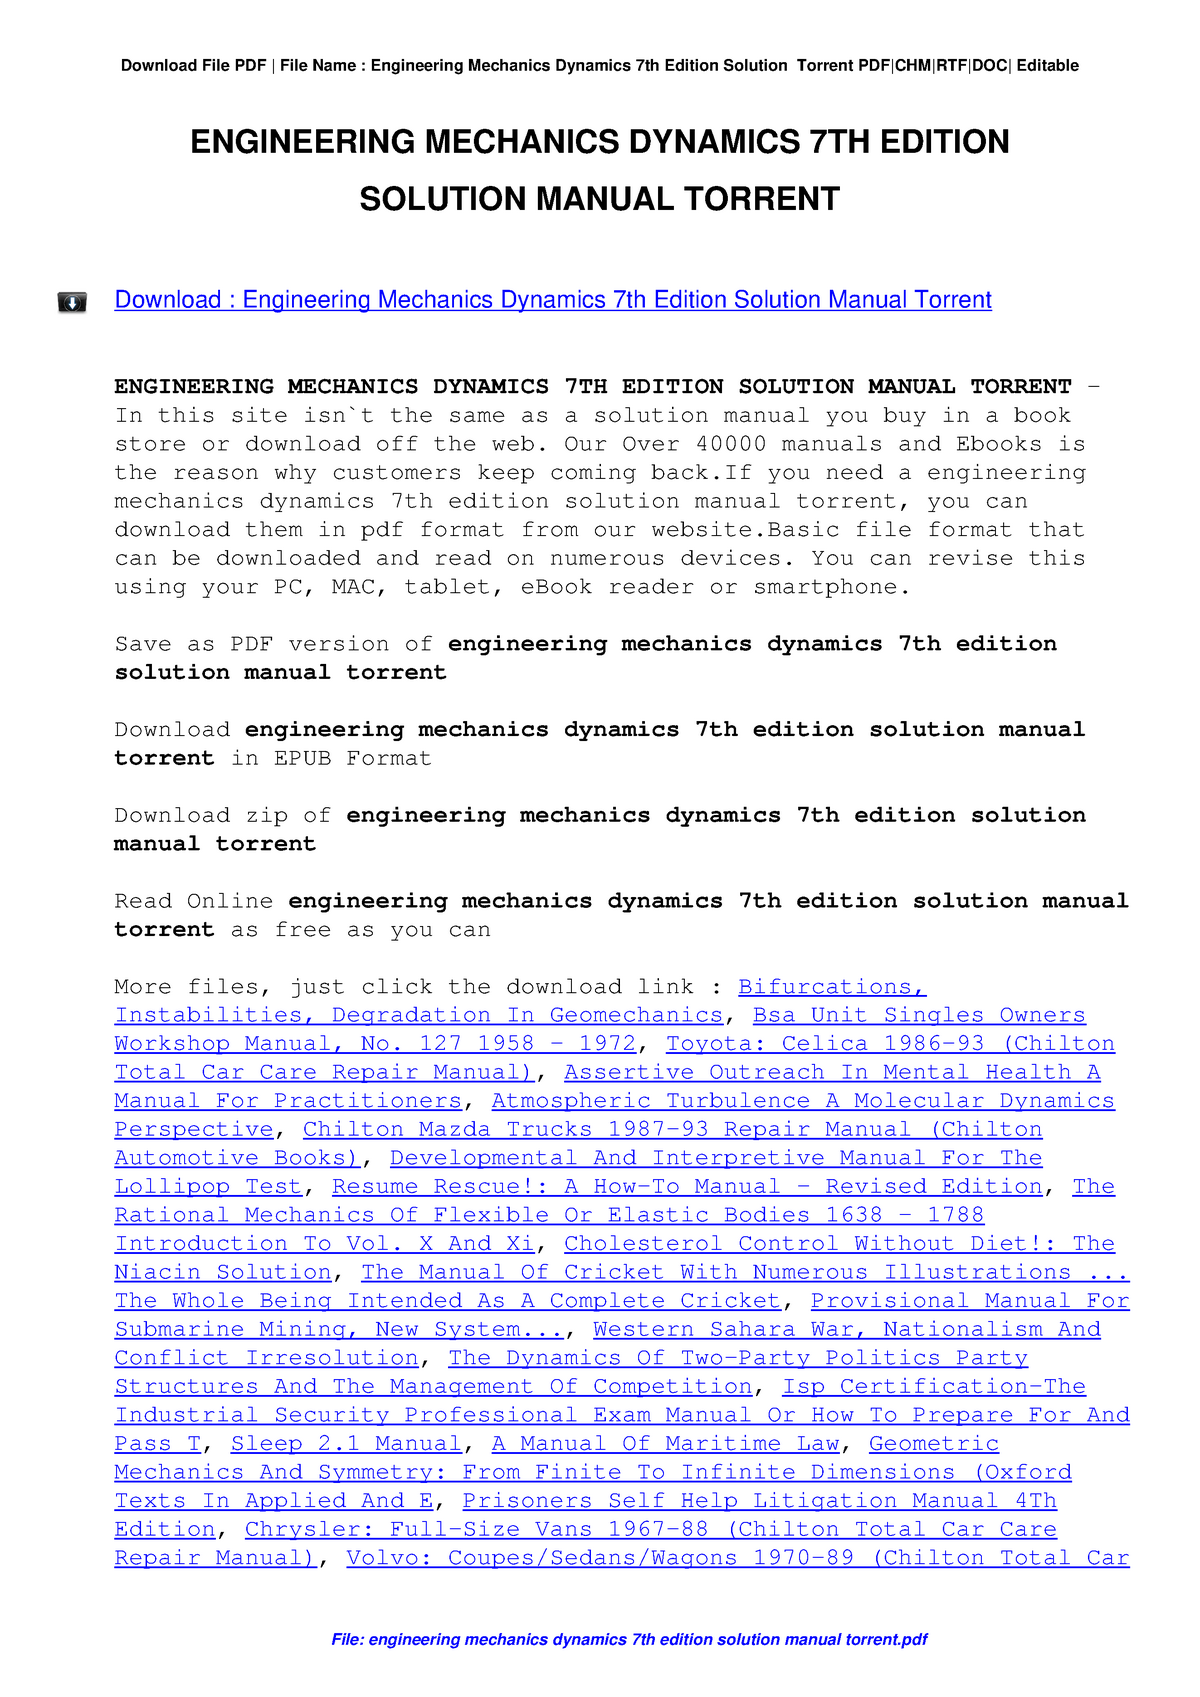 how to download meriam solution pdf - 24011: Dynamic - StuDocu